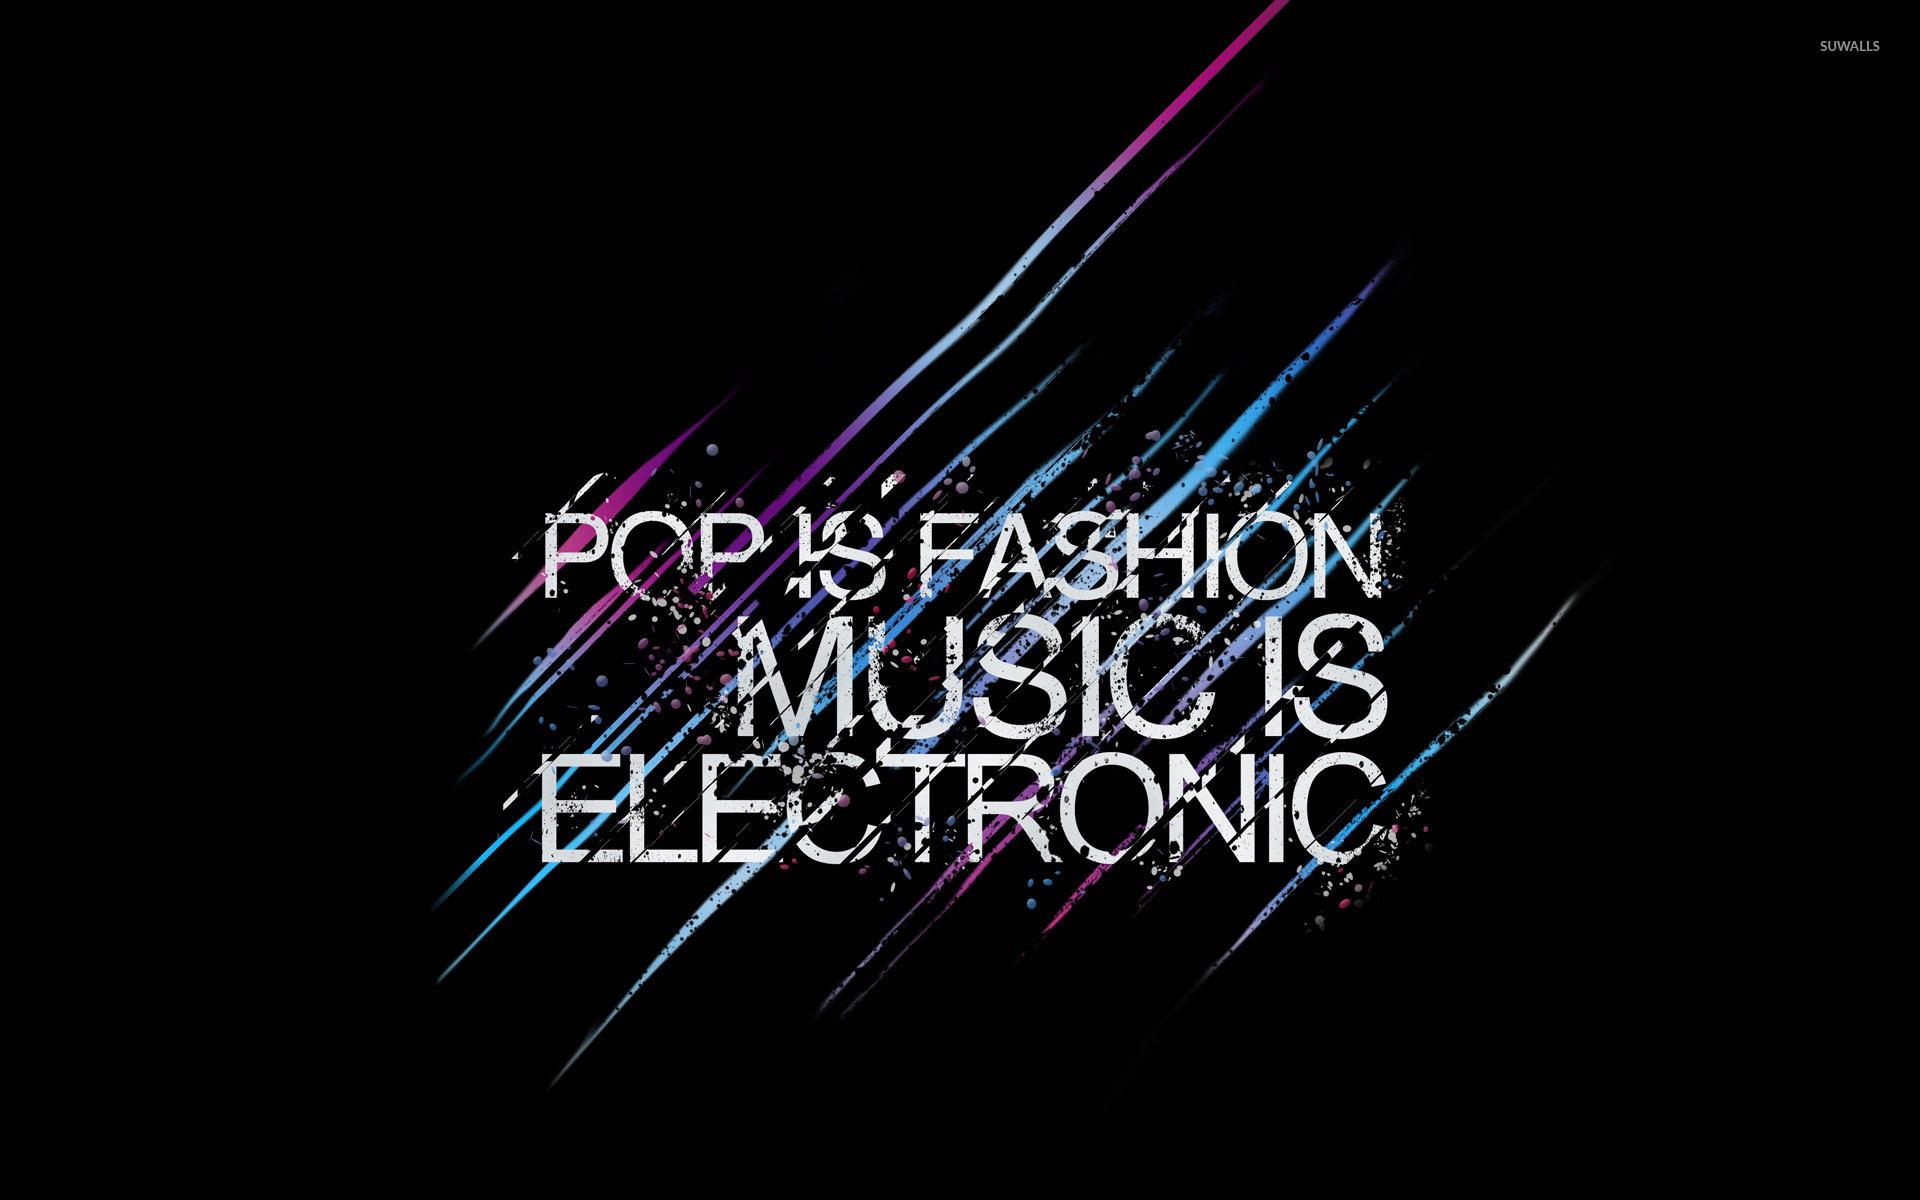 Anime Girls Headphones And Radio 1920x1080 Wallpaper Pop Is Fashion Wallpaper Music Wallpapers 32011